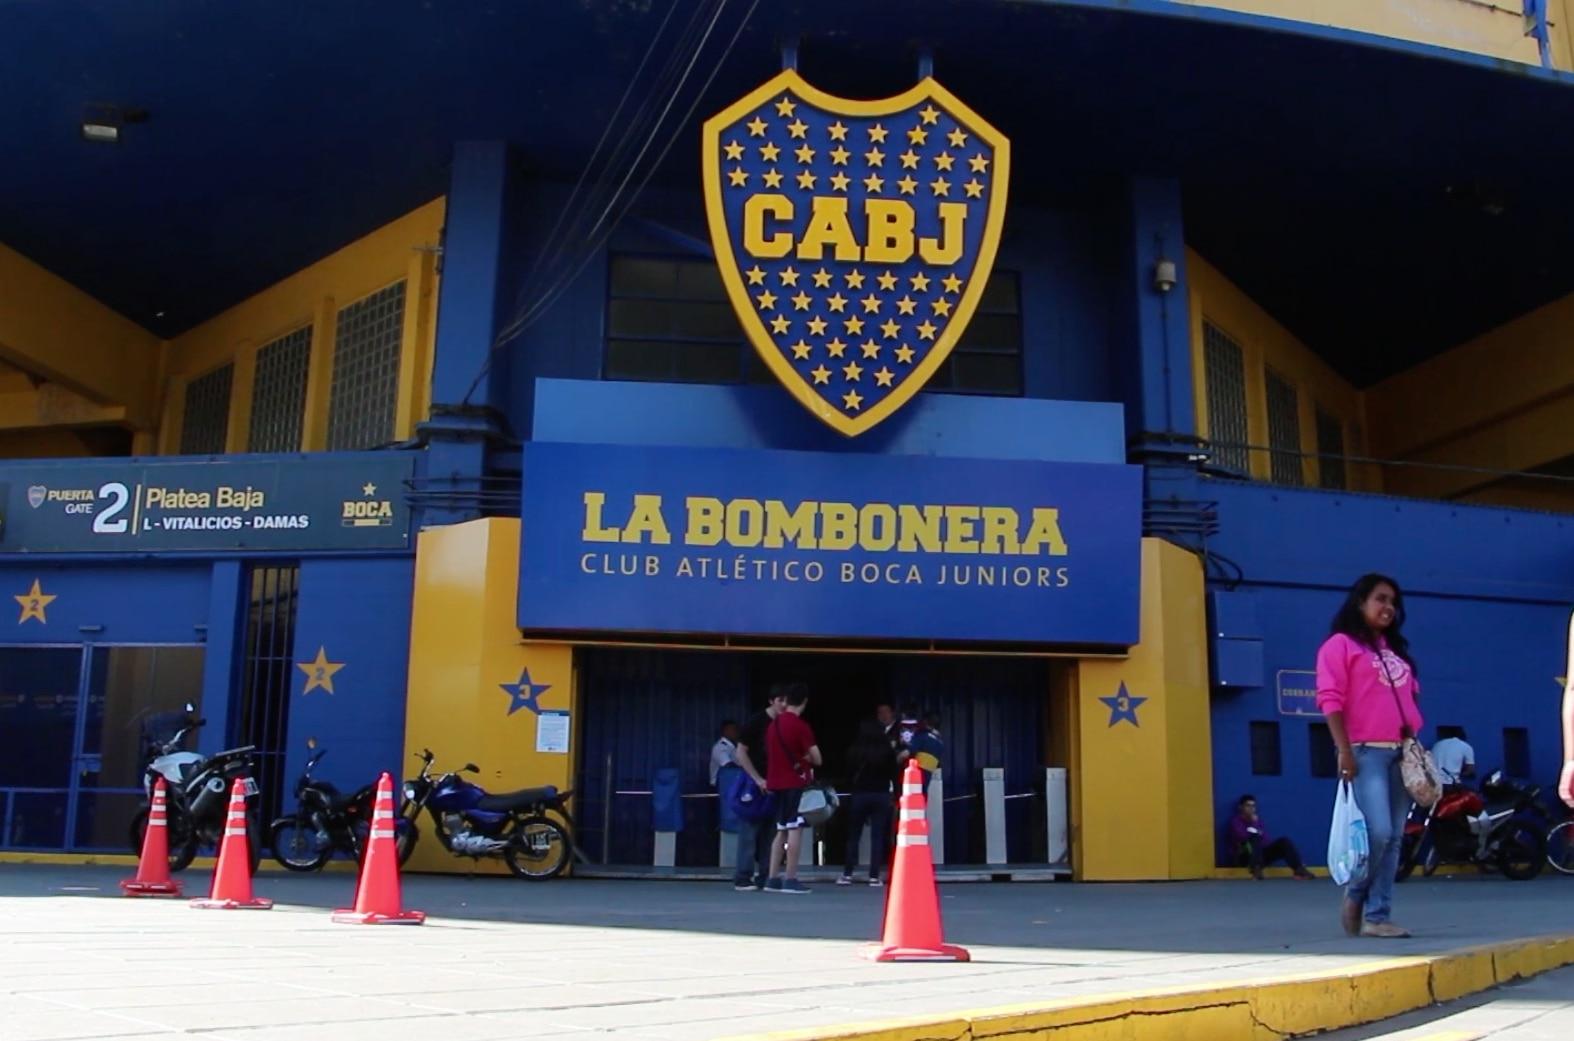 Fotografía entreada la bombonera-estadio-boca juniors